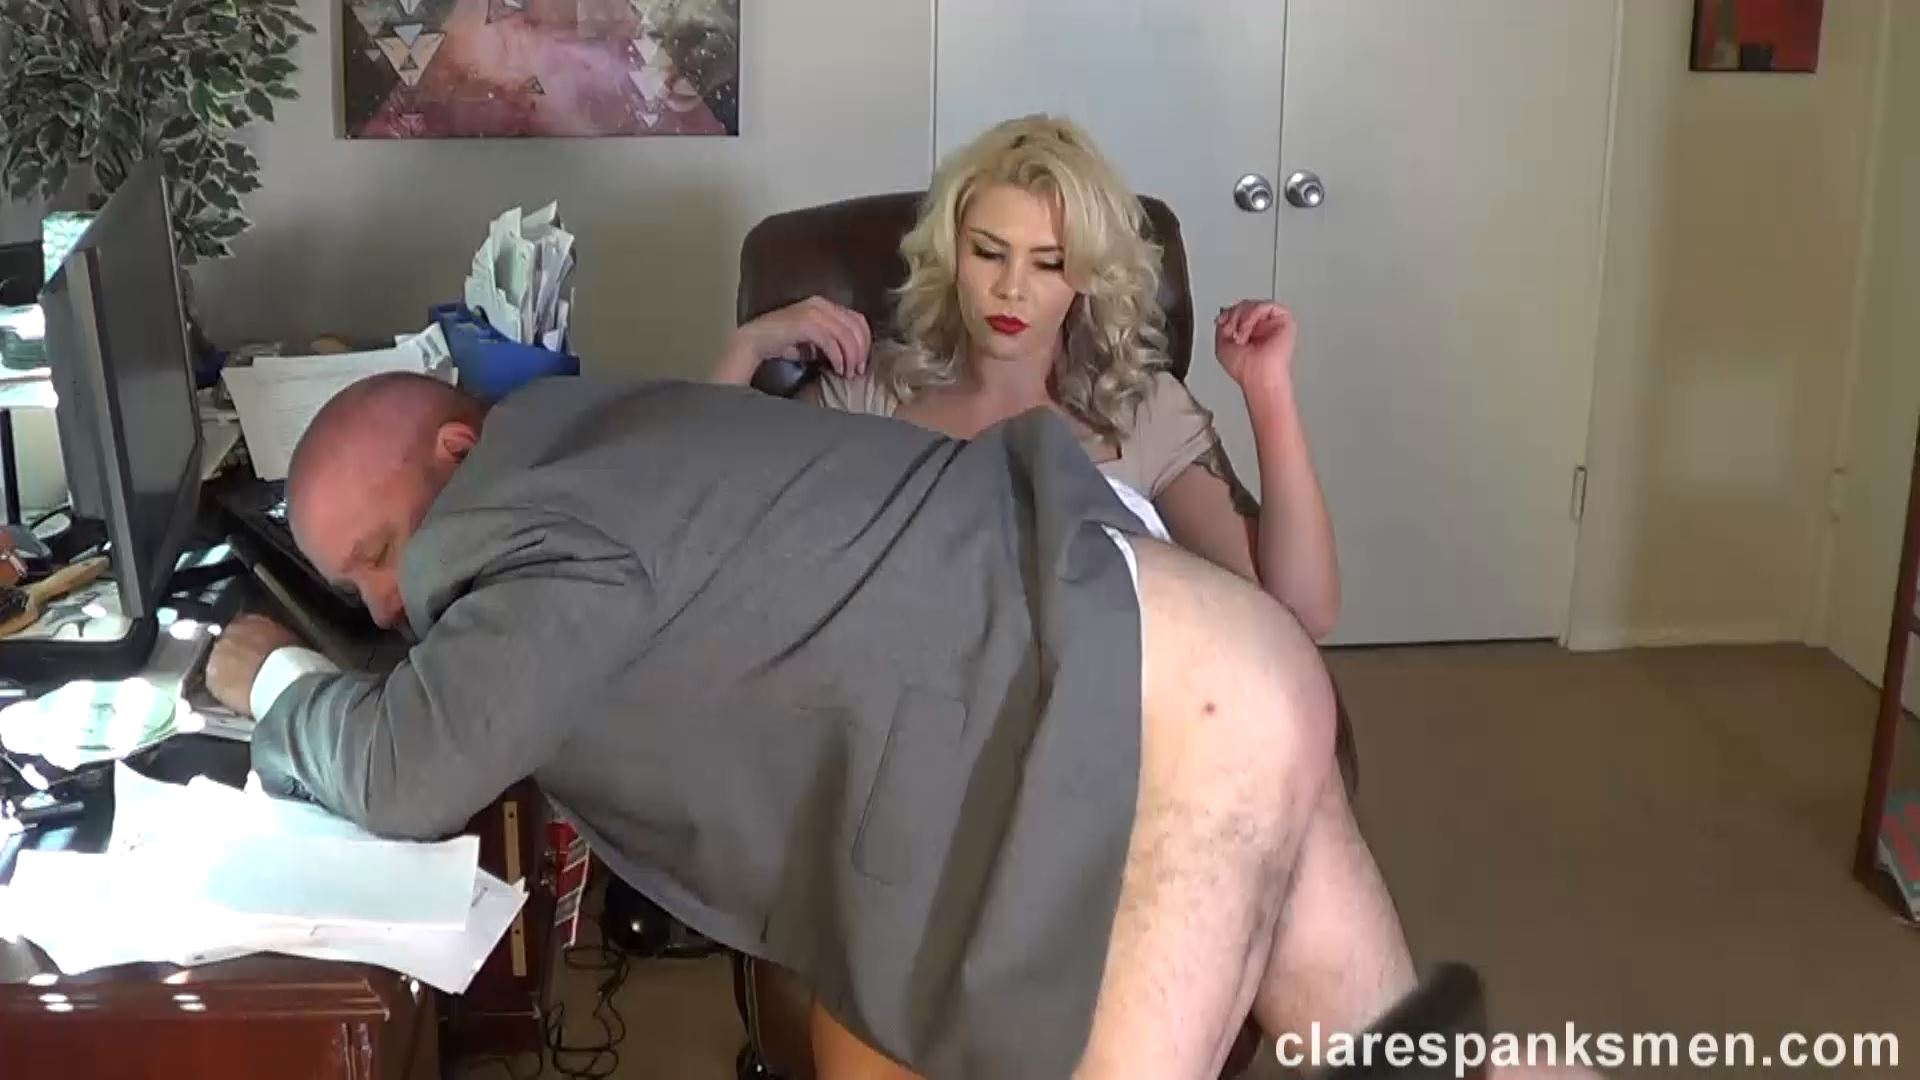 Bella Bathory In Scene: Bella Bathory Trains Men Day 1 - CLARESPANKSMEN - FULL HD/1080p/MP4